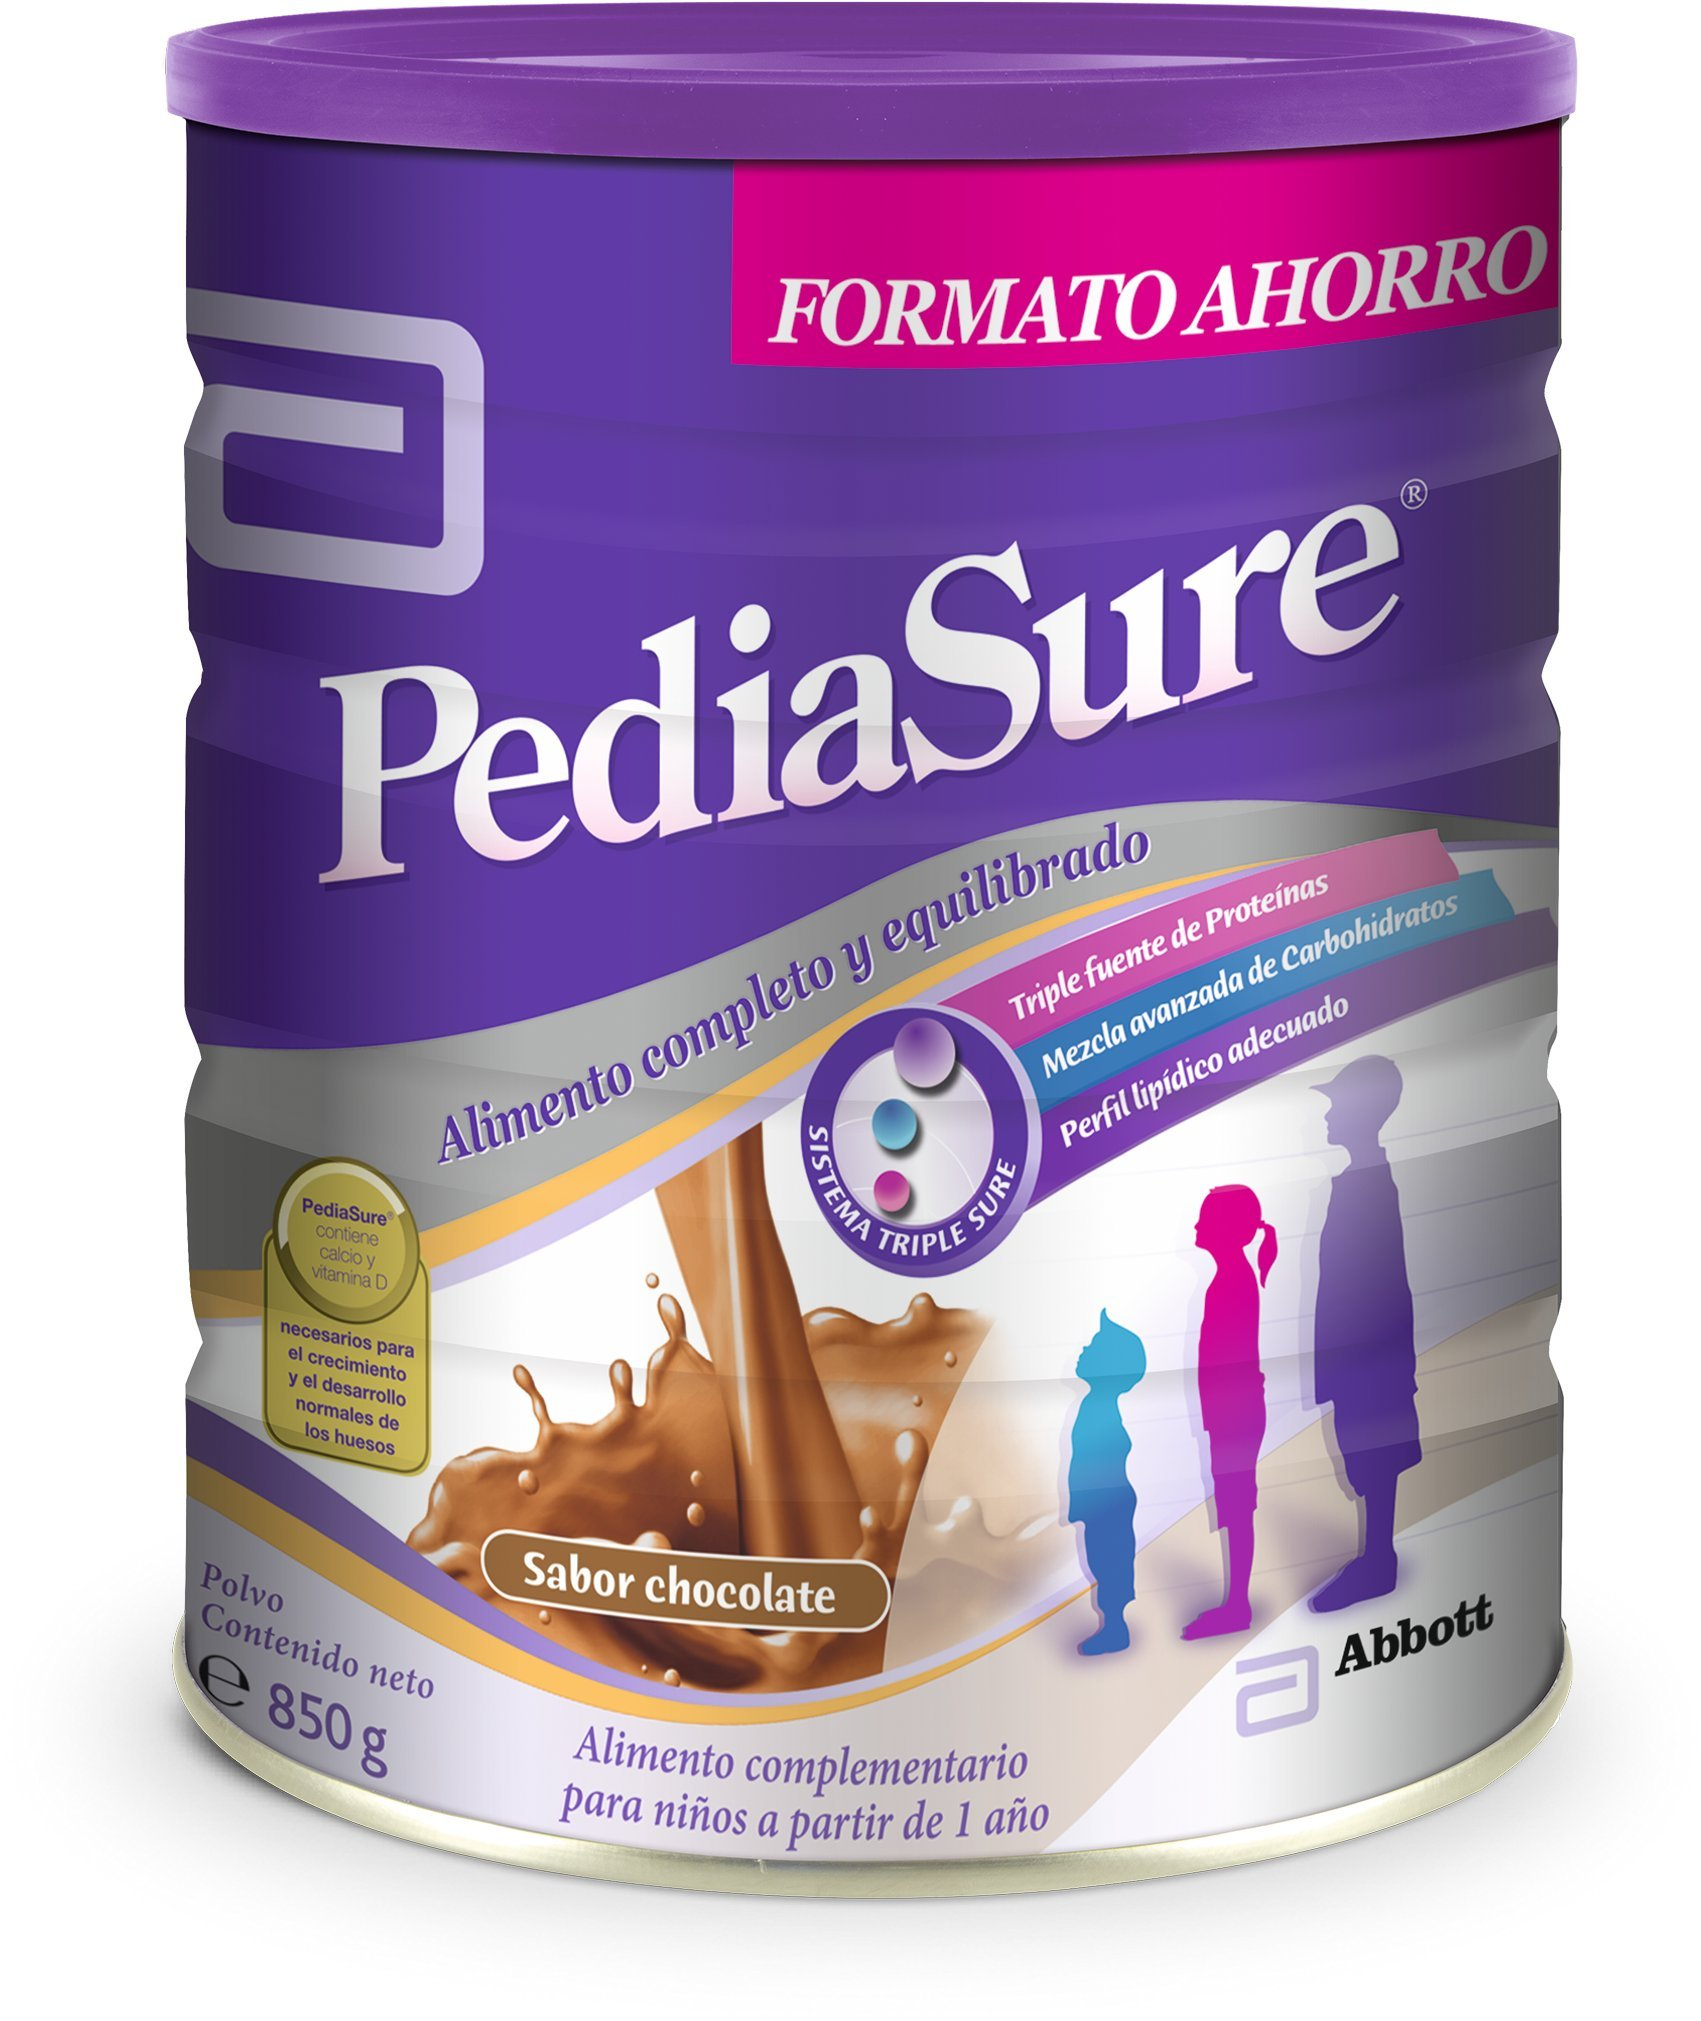 PediaSure Polvo lata 850g sabor chocolate. Alimento completo y equilibrado para niños a partir de